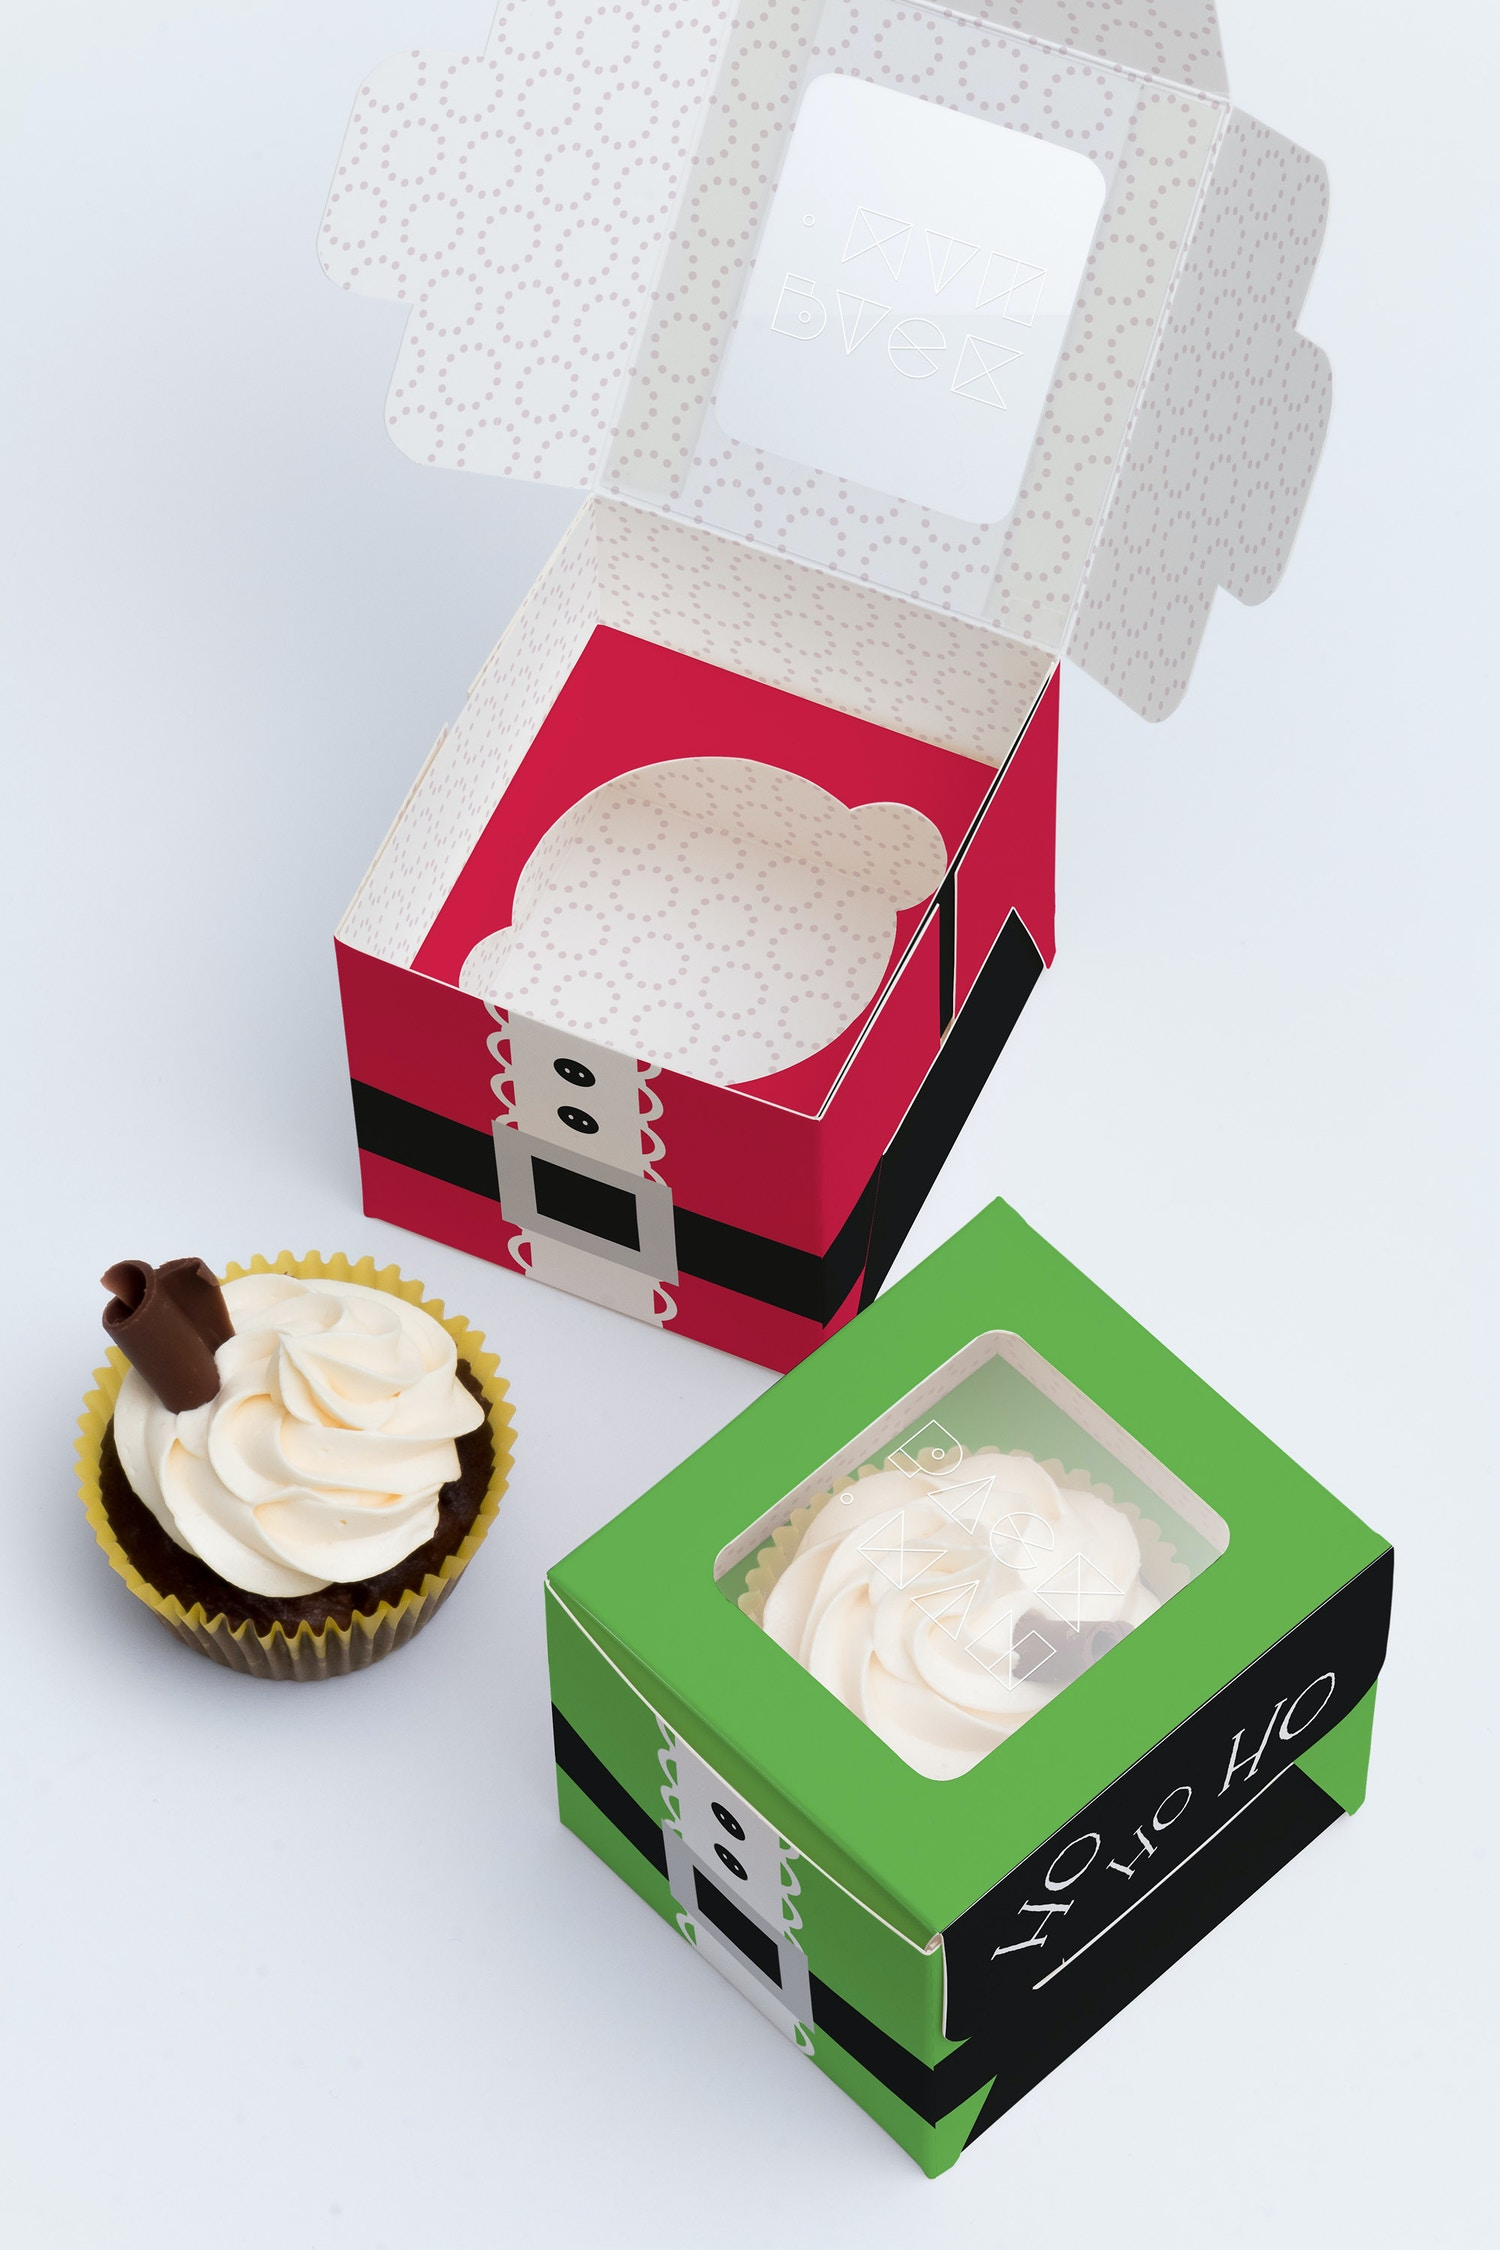 Maqueta para un Cupcake 01 por Ktyellow  en Original Mockups